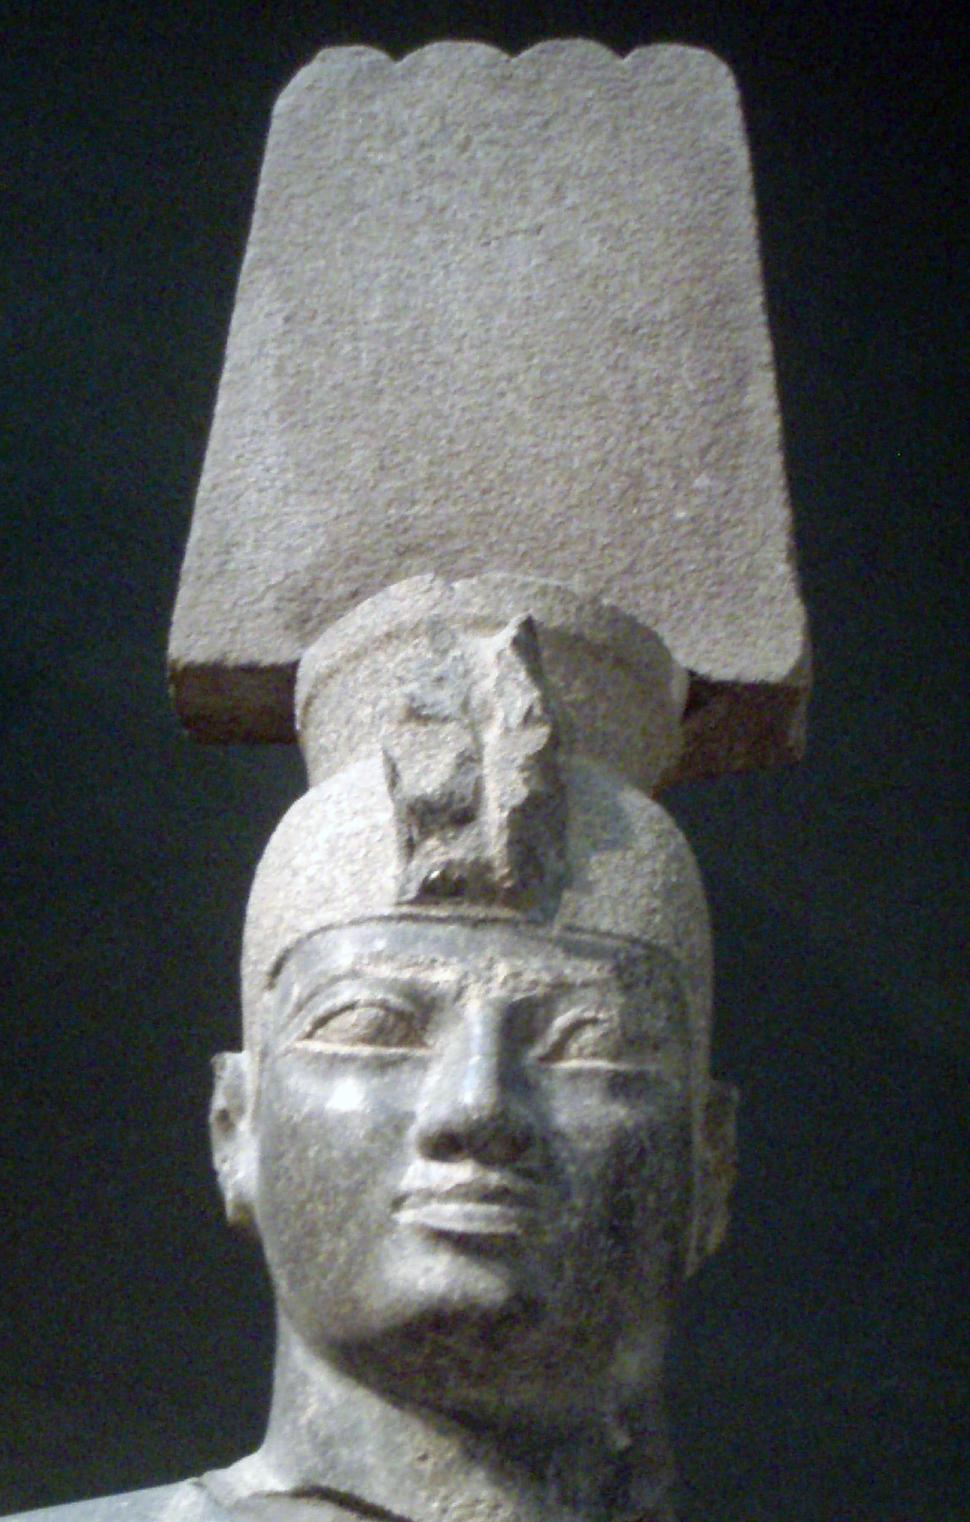 Anlamani-Statue-CloseUpOfHead MuseumOfFineArtsBoston